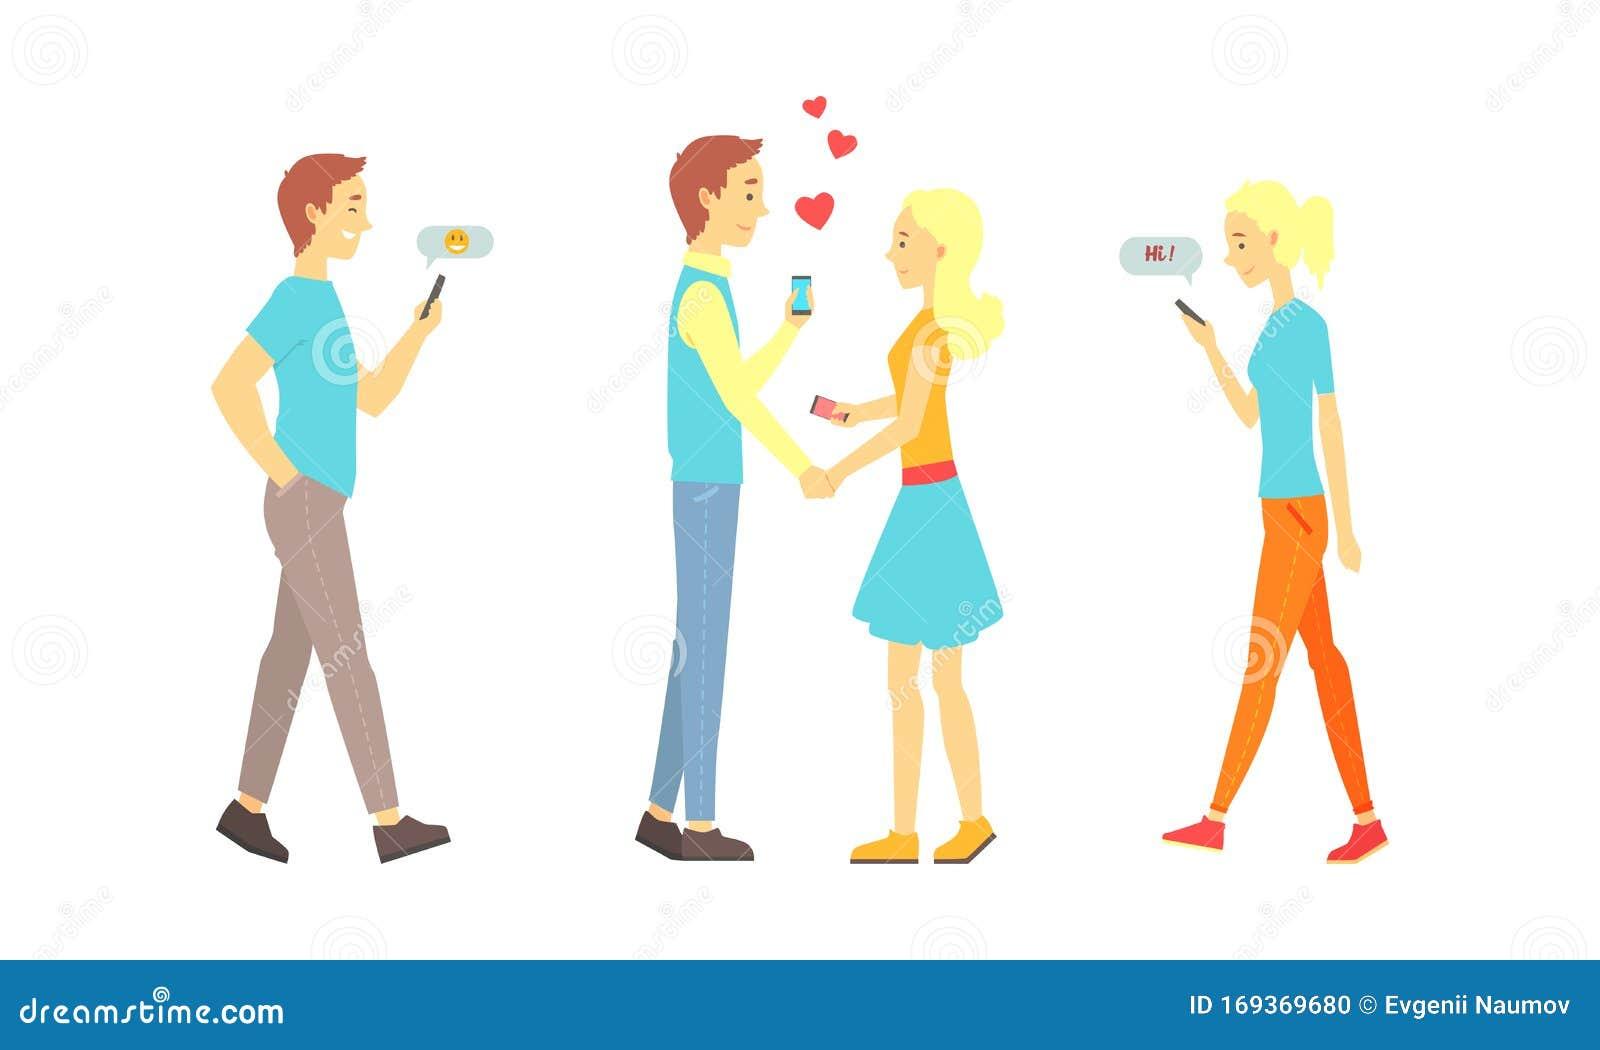 jw dating free